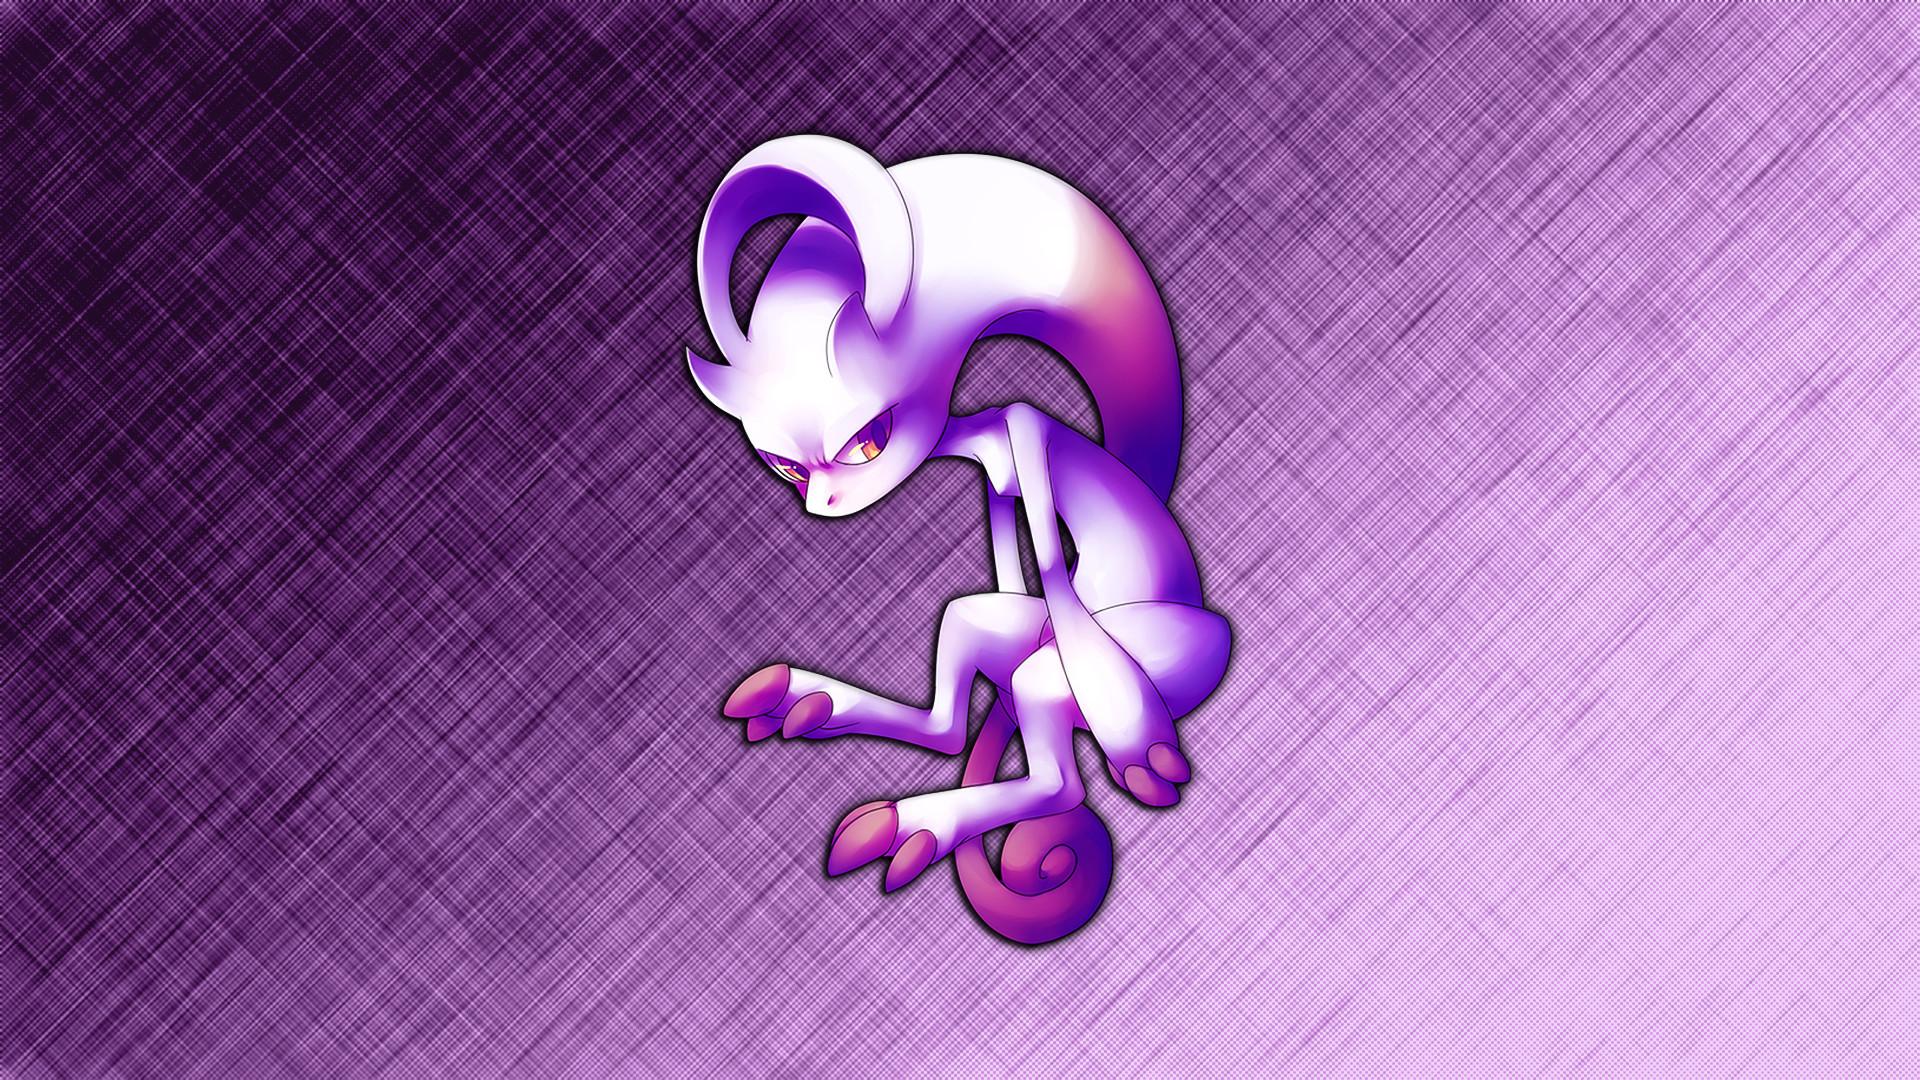 Pokemon Mewtwo Wallpapers 1680×1050 Mewtwo Wallpapers (27 Wallpapers)    Adorable Wallpapers   Desktop   Pinterest   Wallpaper